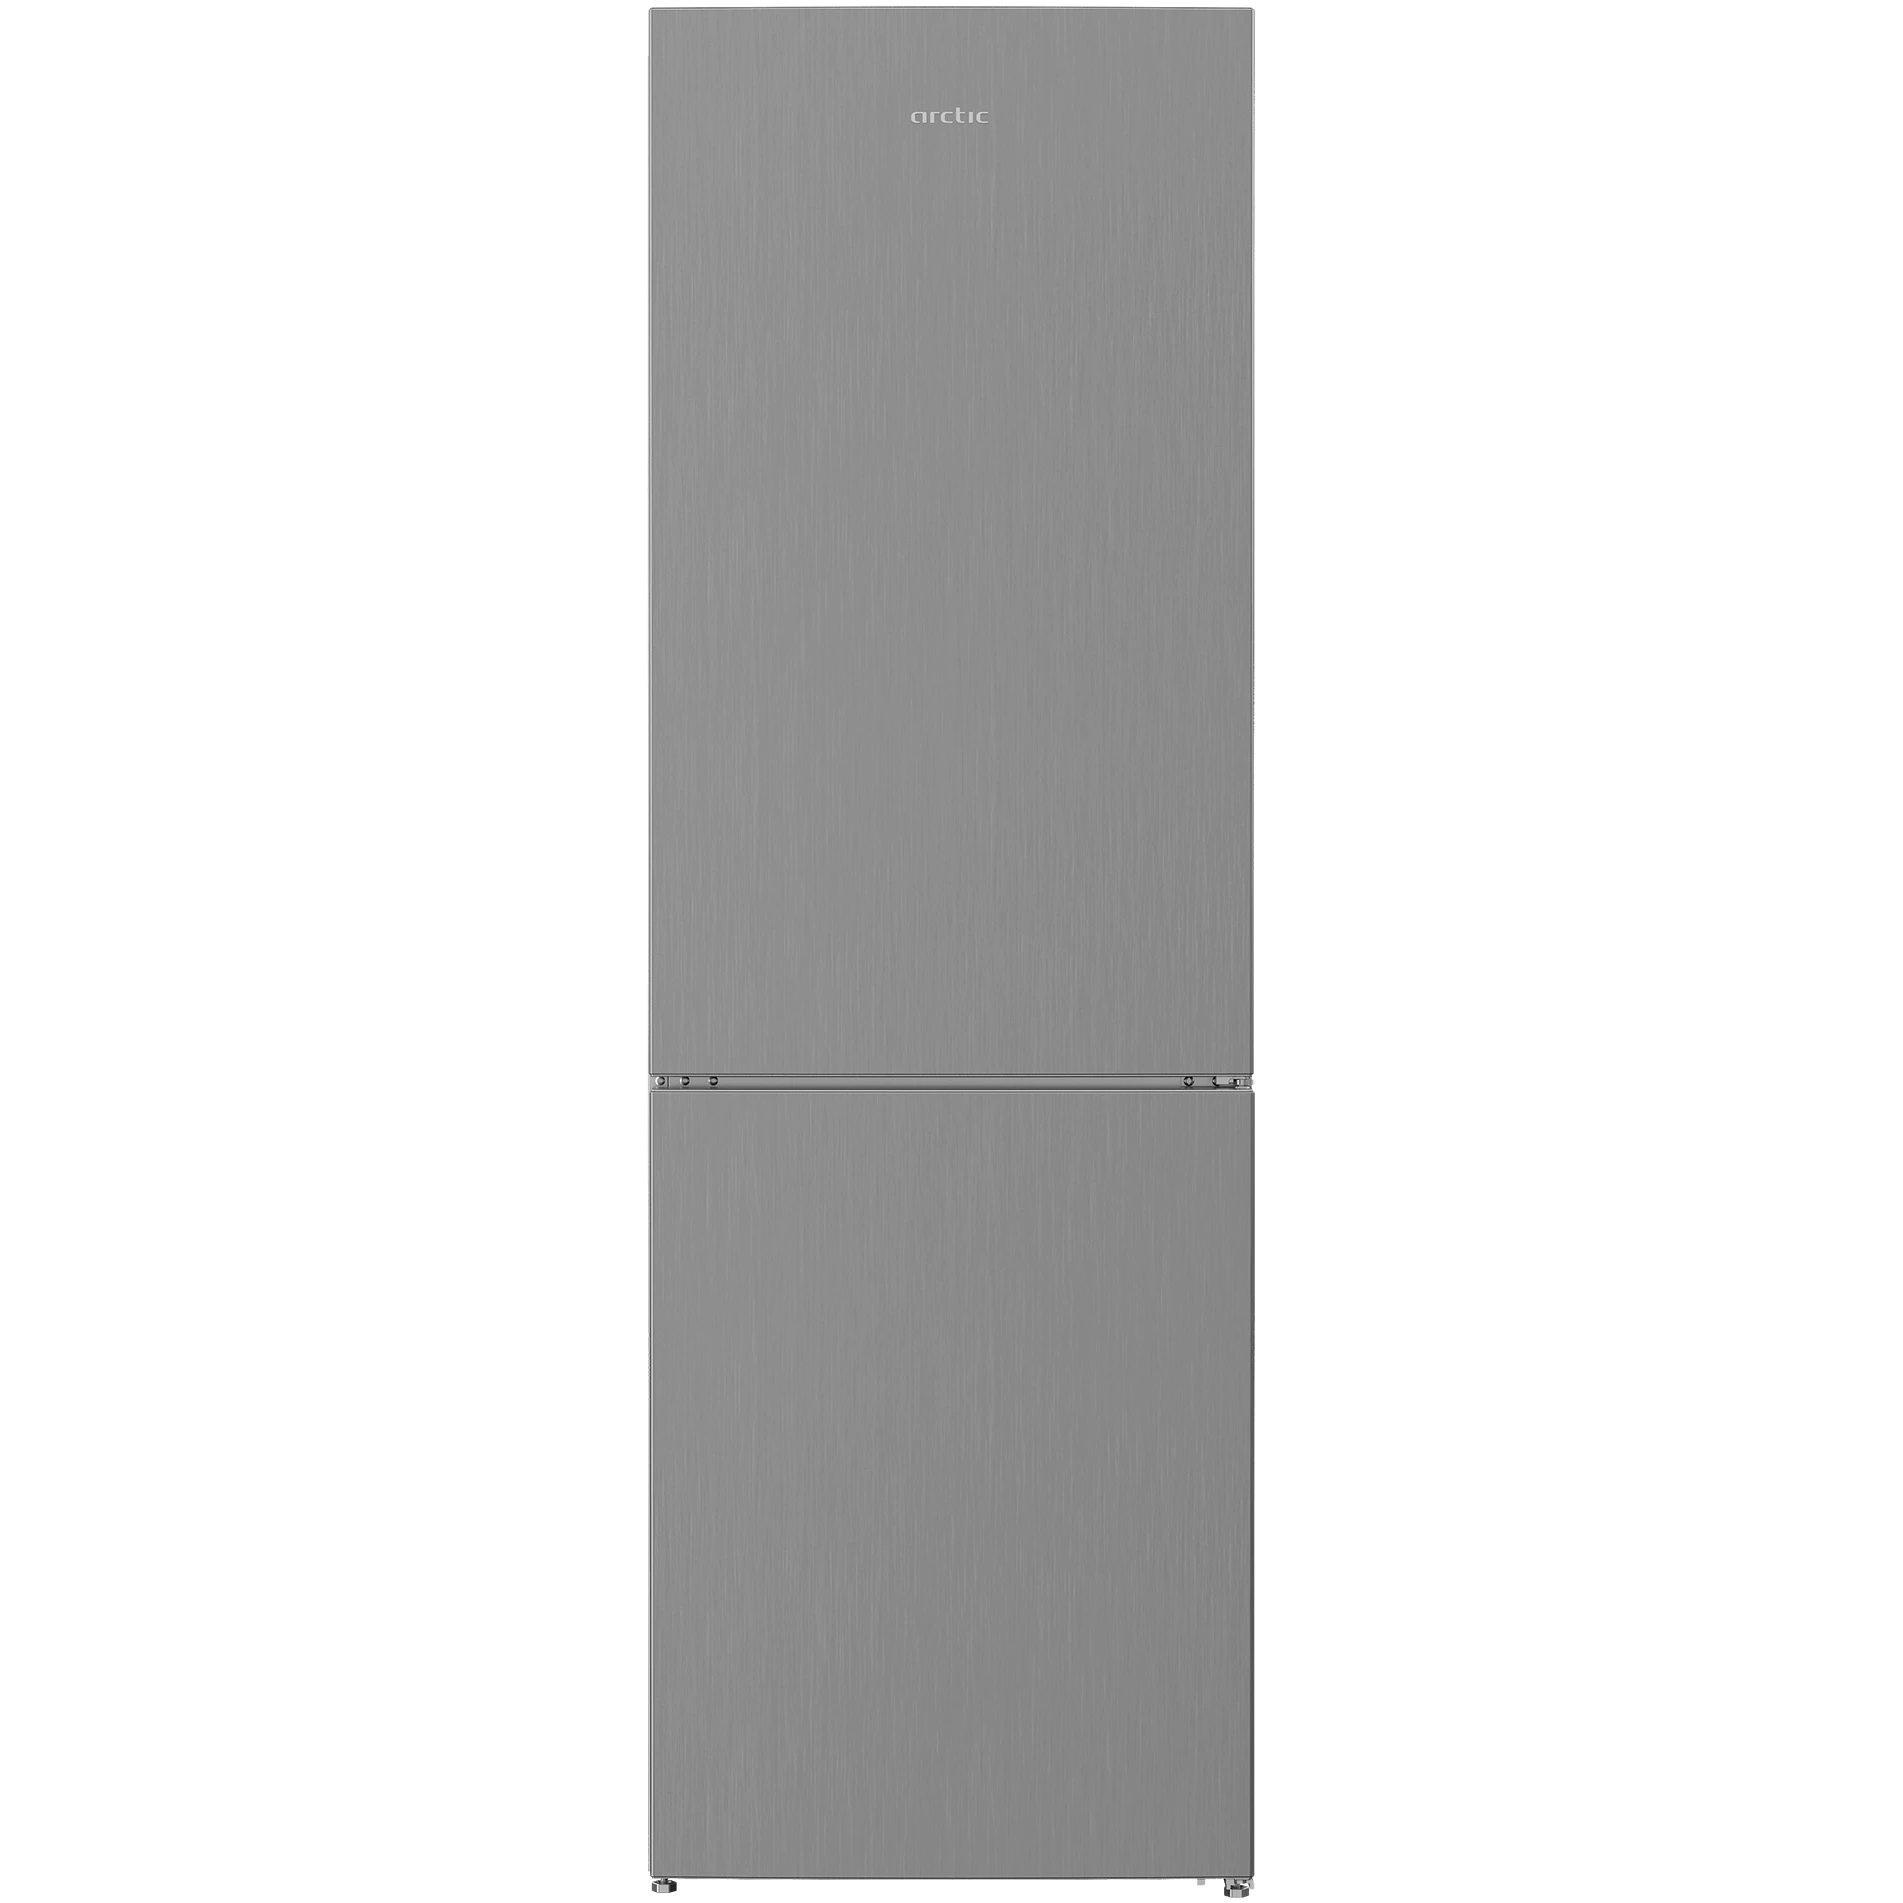 Хладилник с фризер Arctic AK60320M30MT295 л, Клас A+, Garden Fresh, Mix Zone, H 185.1 см, Сив